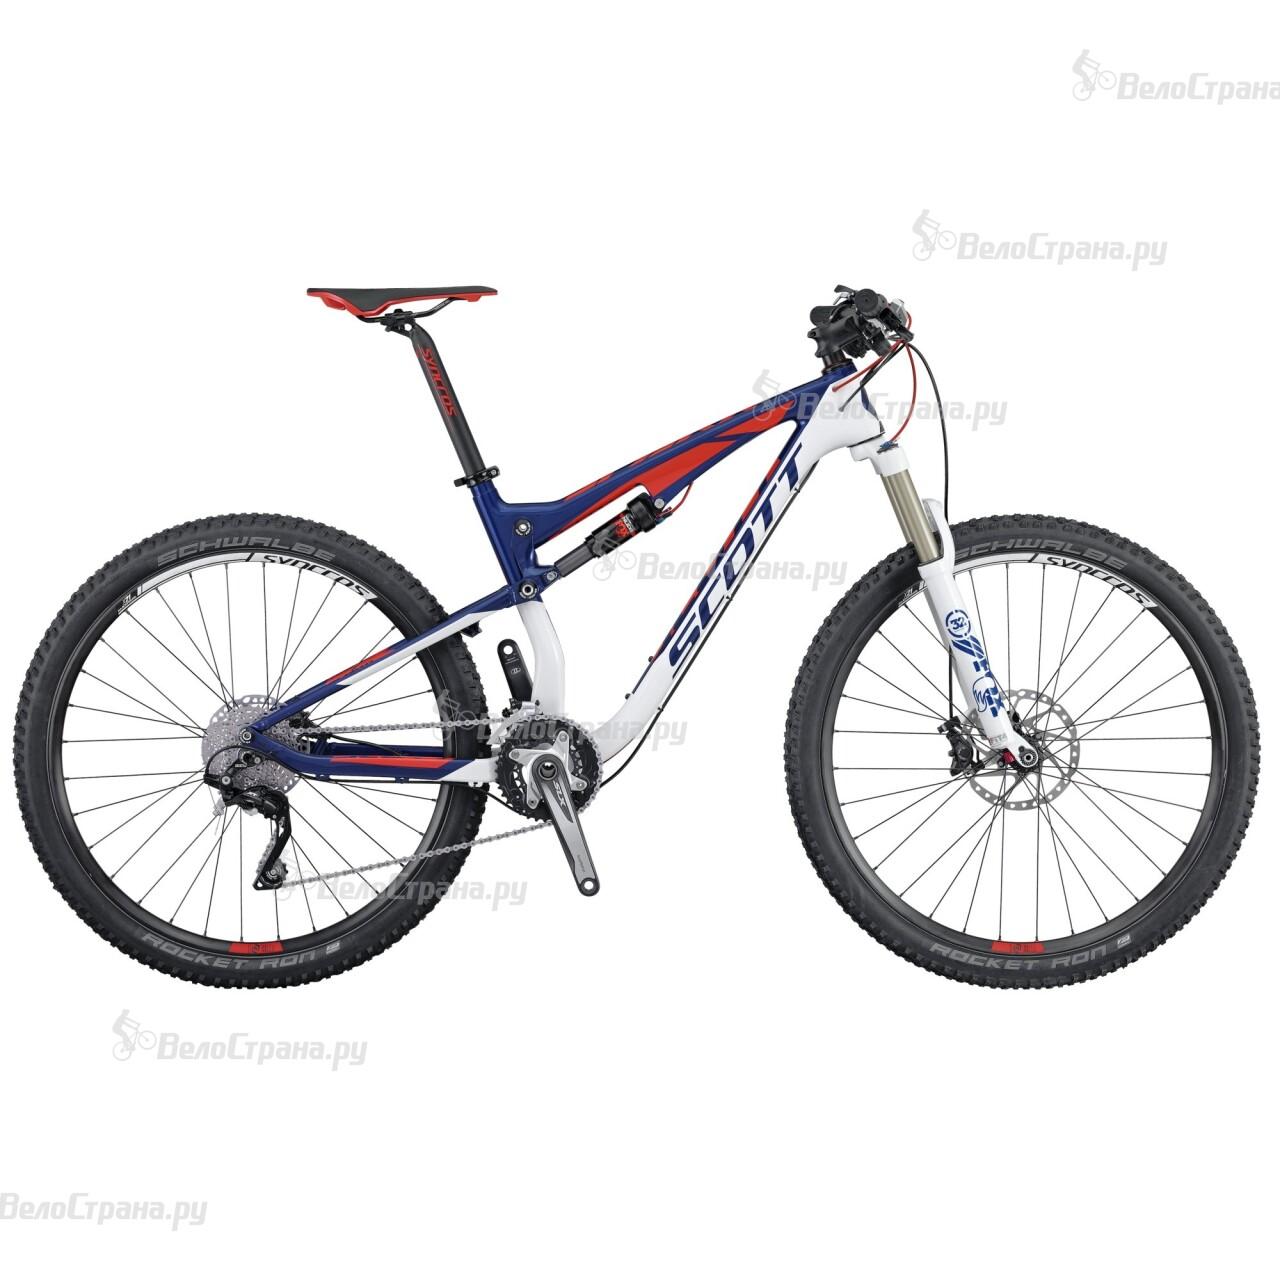 цены Велосипед Scott Spark 930 (2016)